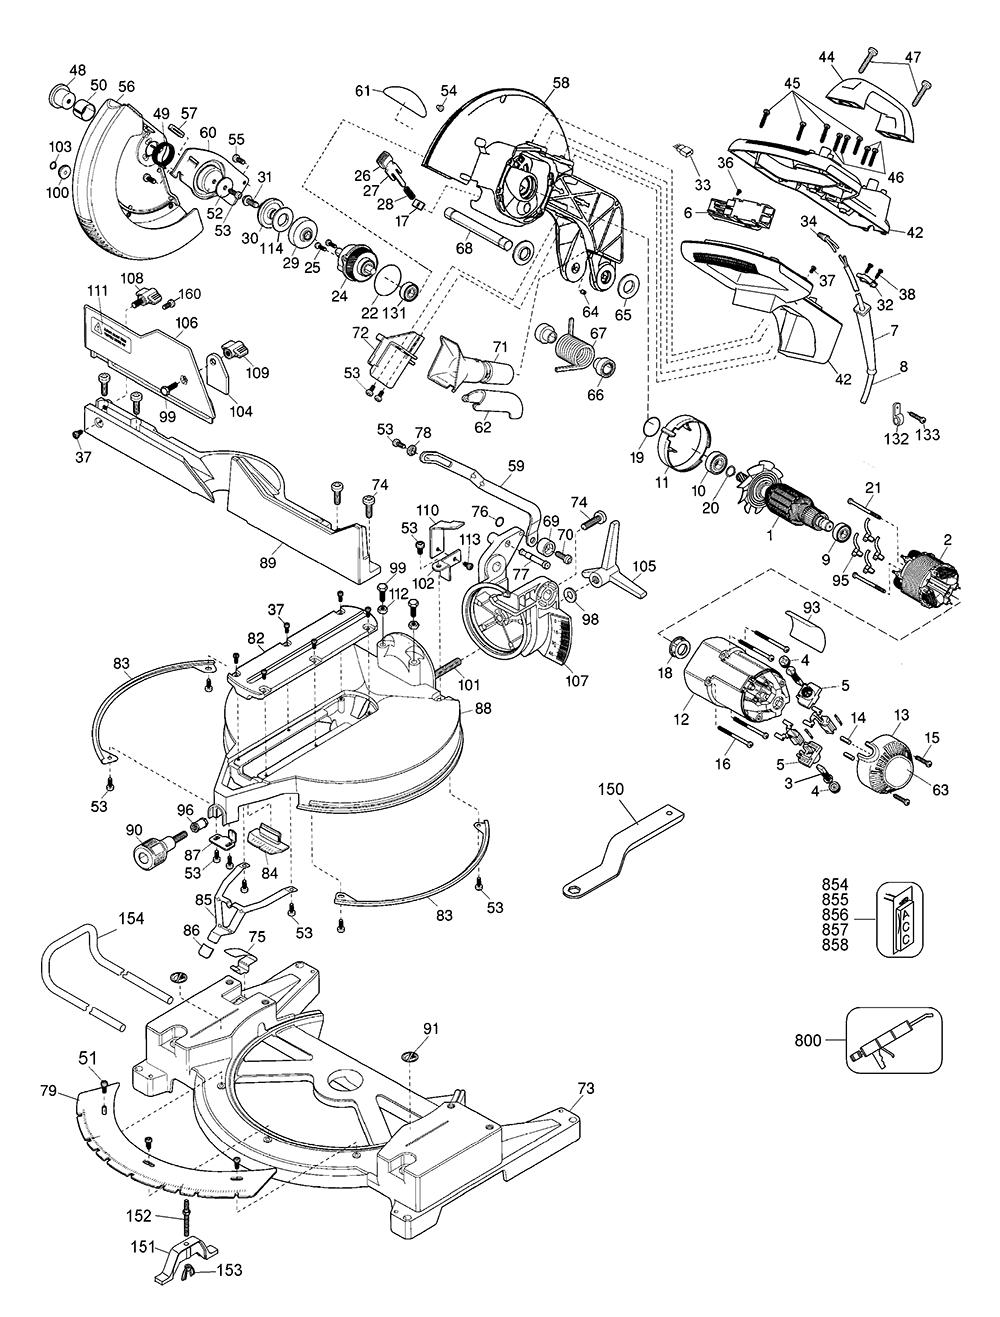 dewalt saw parts diagram